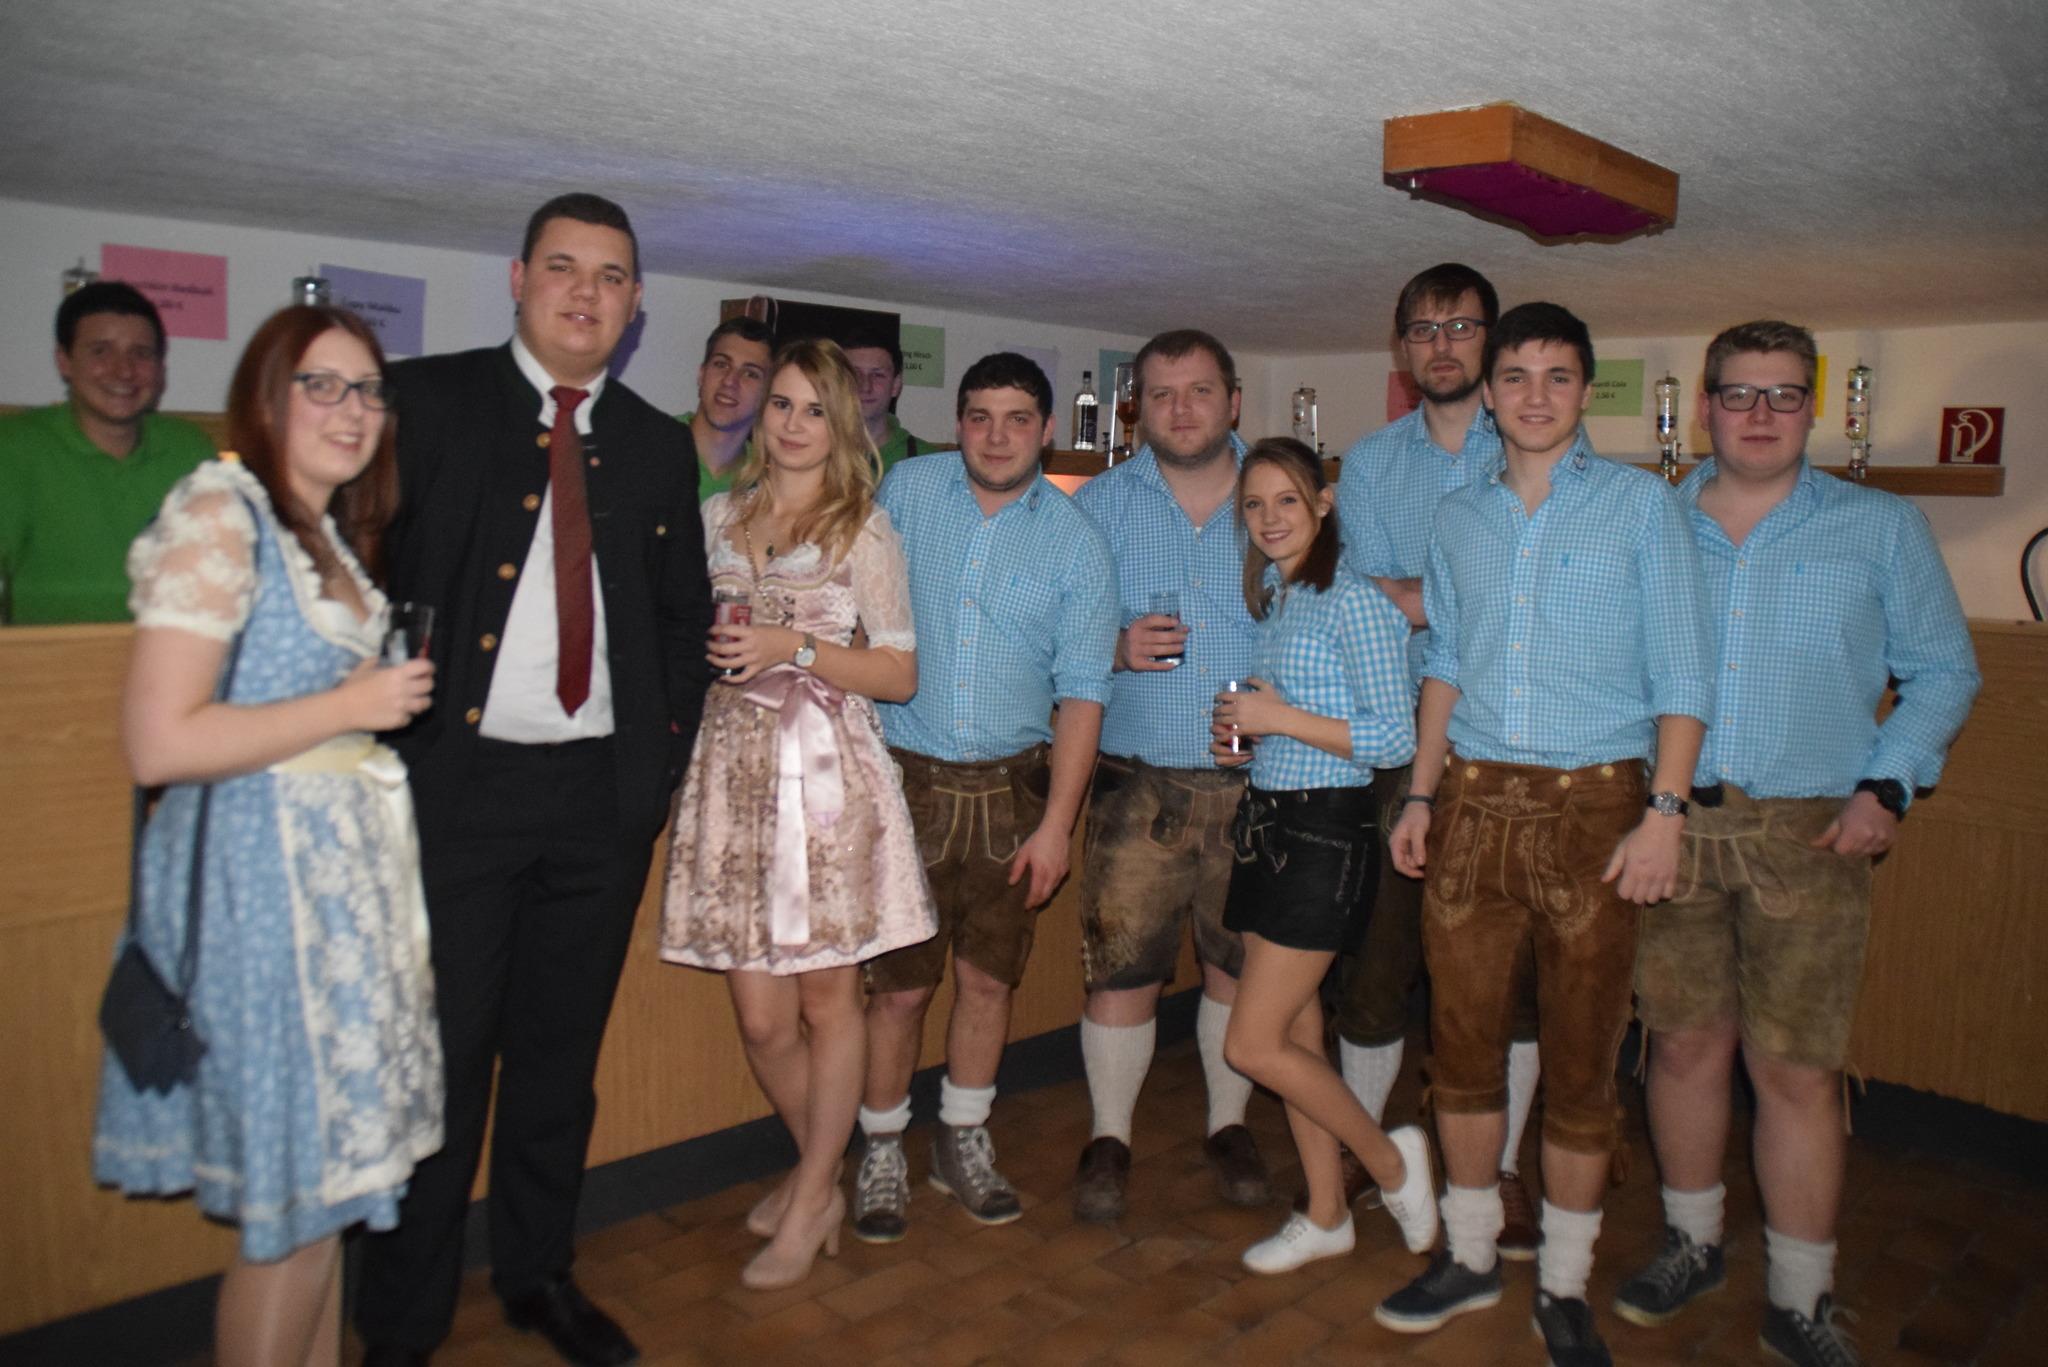 Vitis partnersuche Studenten singles biberbach